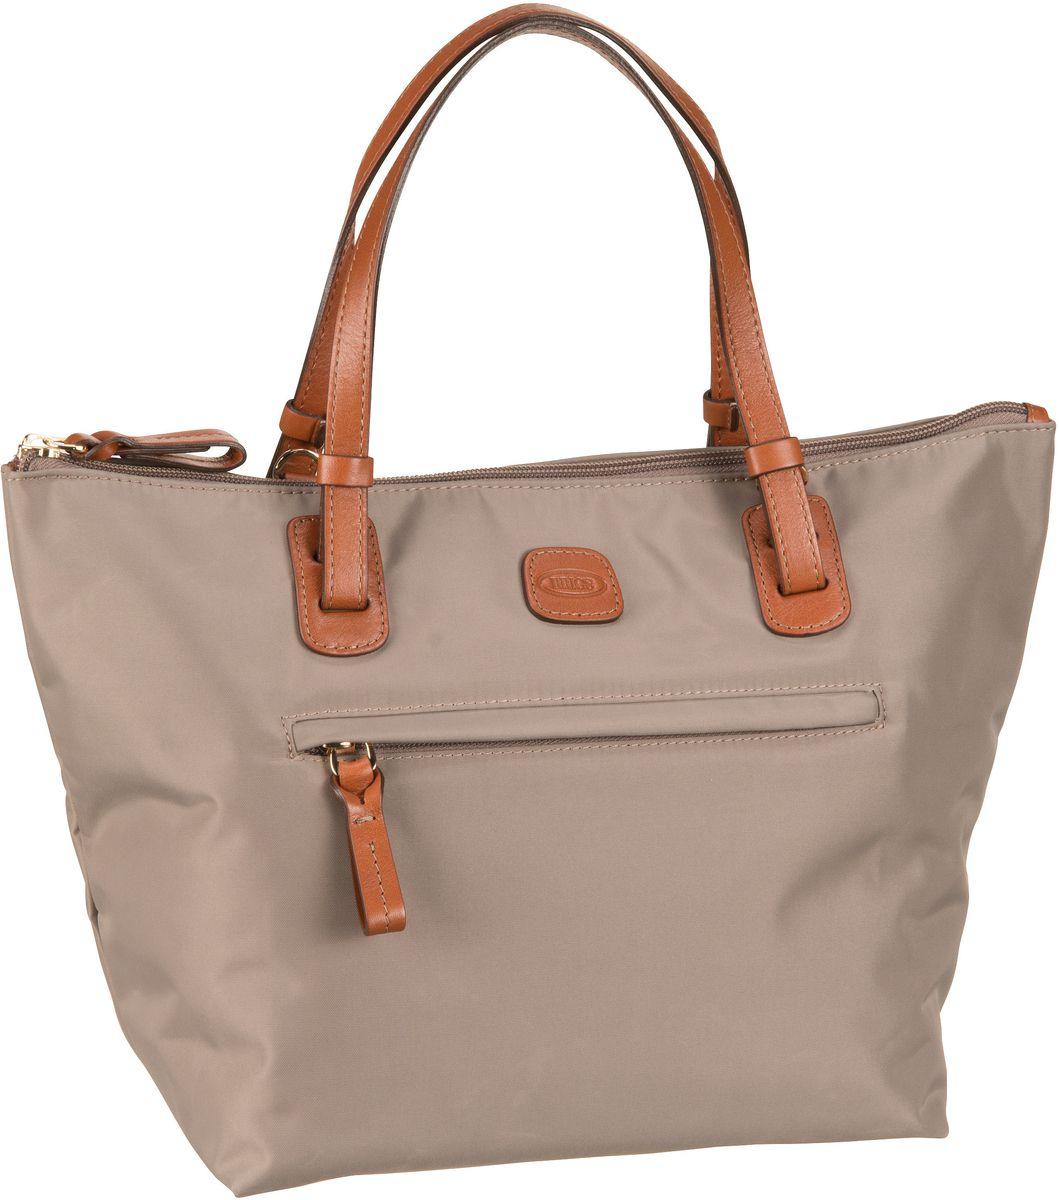 Umhängetasche X-Bag Damentasche 42733 Tortora Bric's o9LEjA